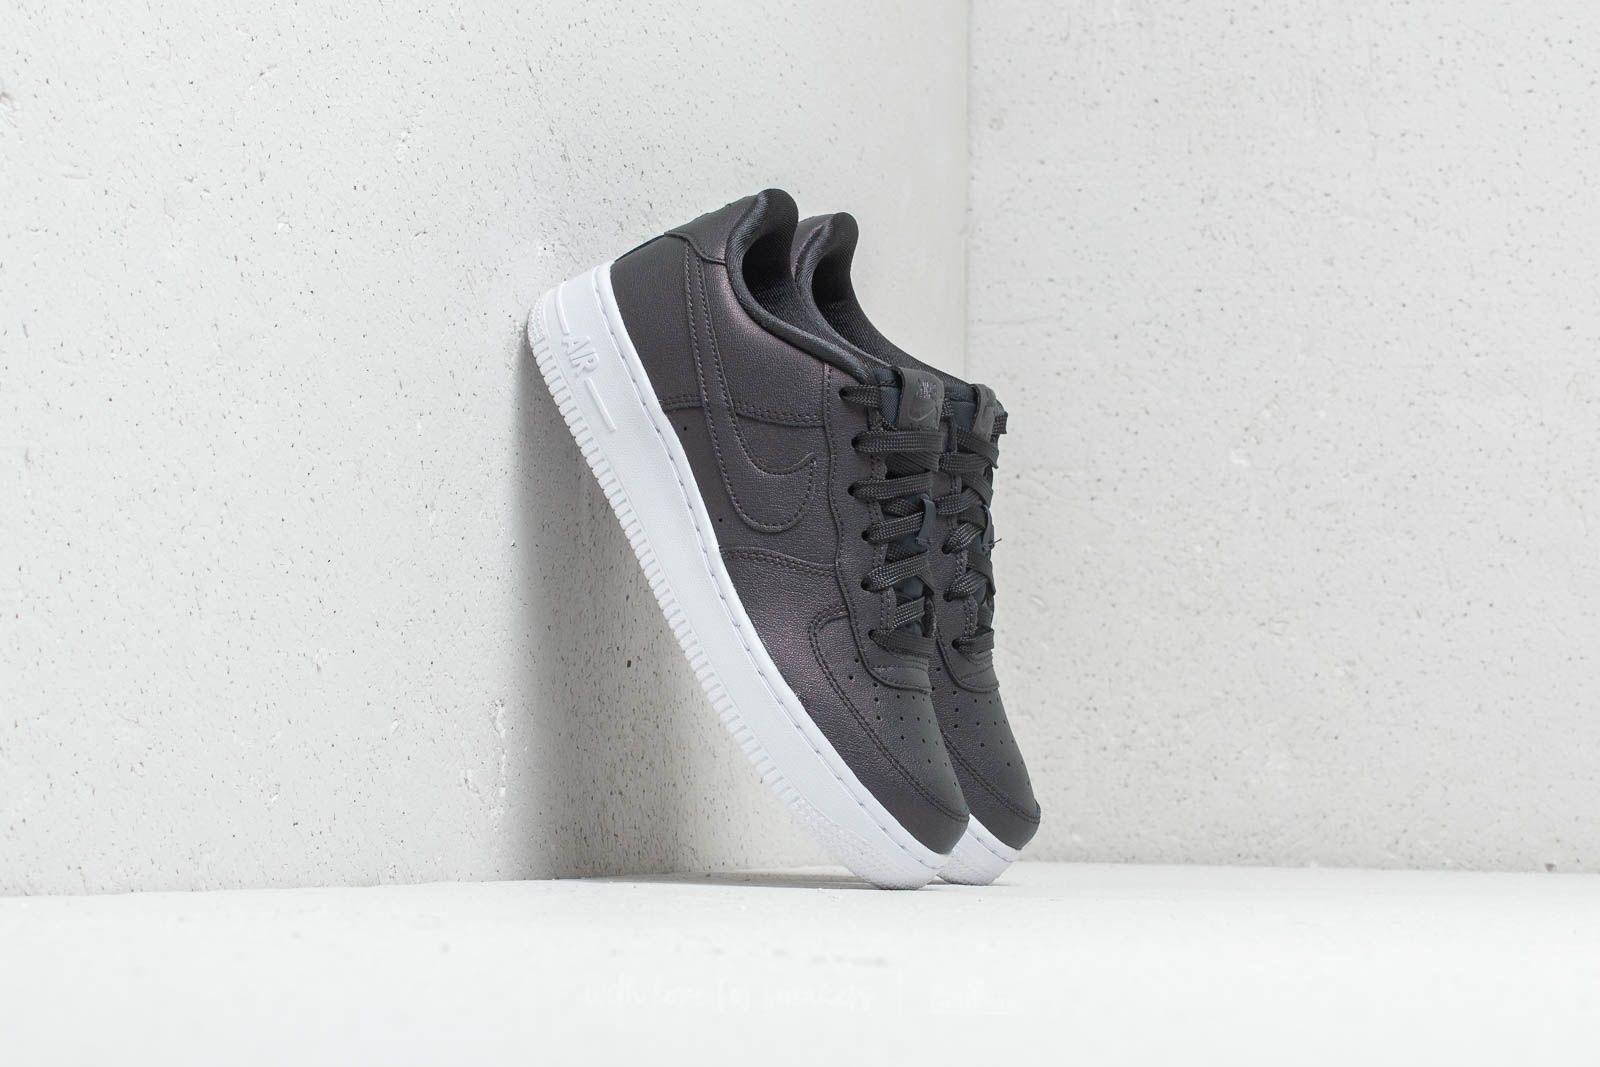 nike air force 1 gs dark gray